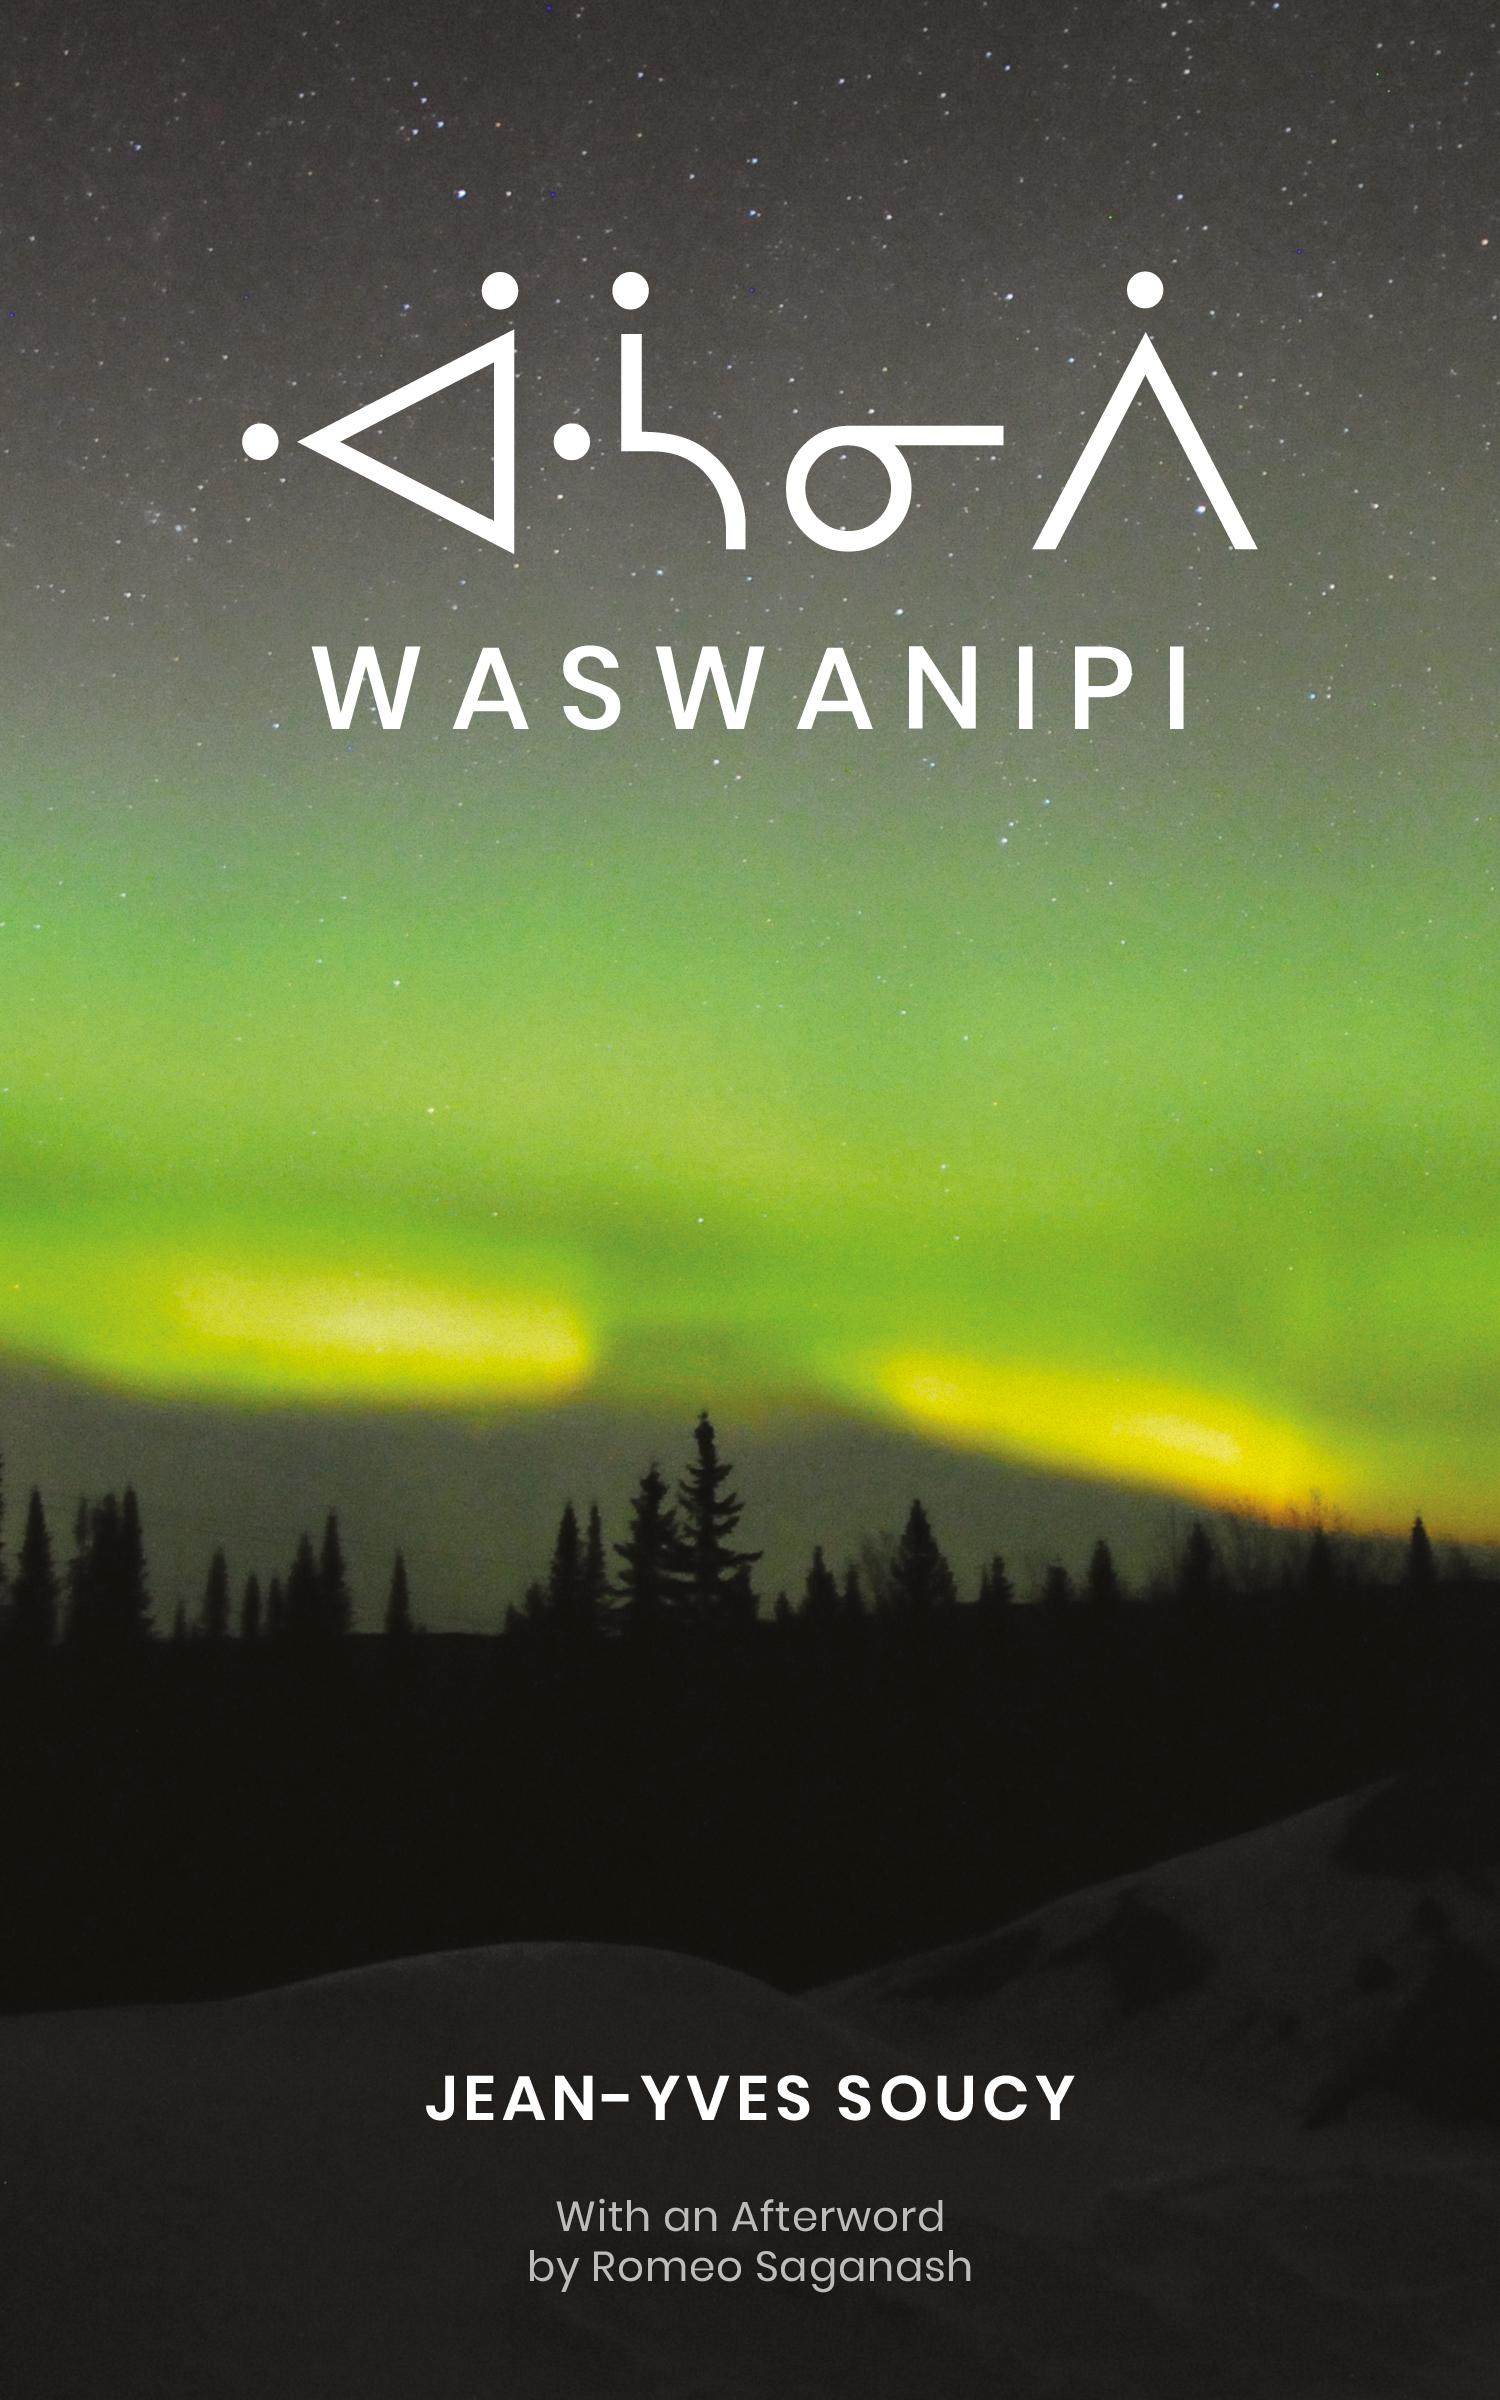 Waswanipi